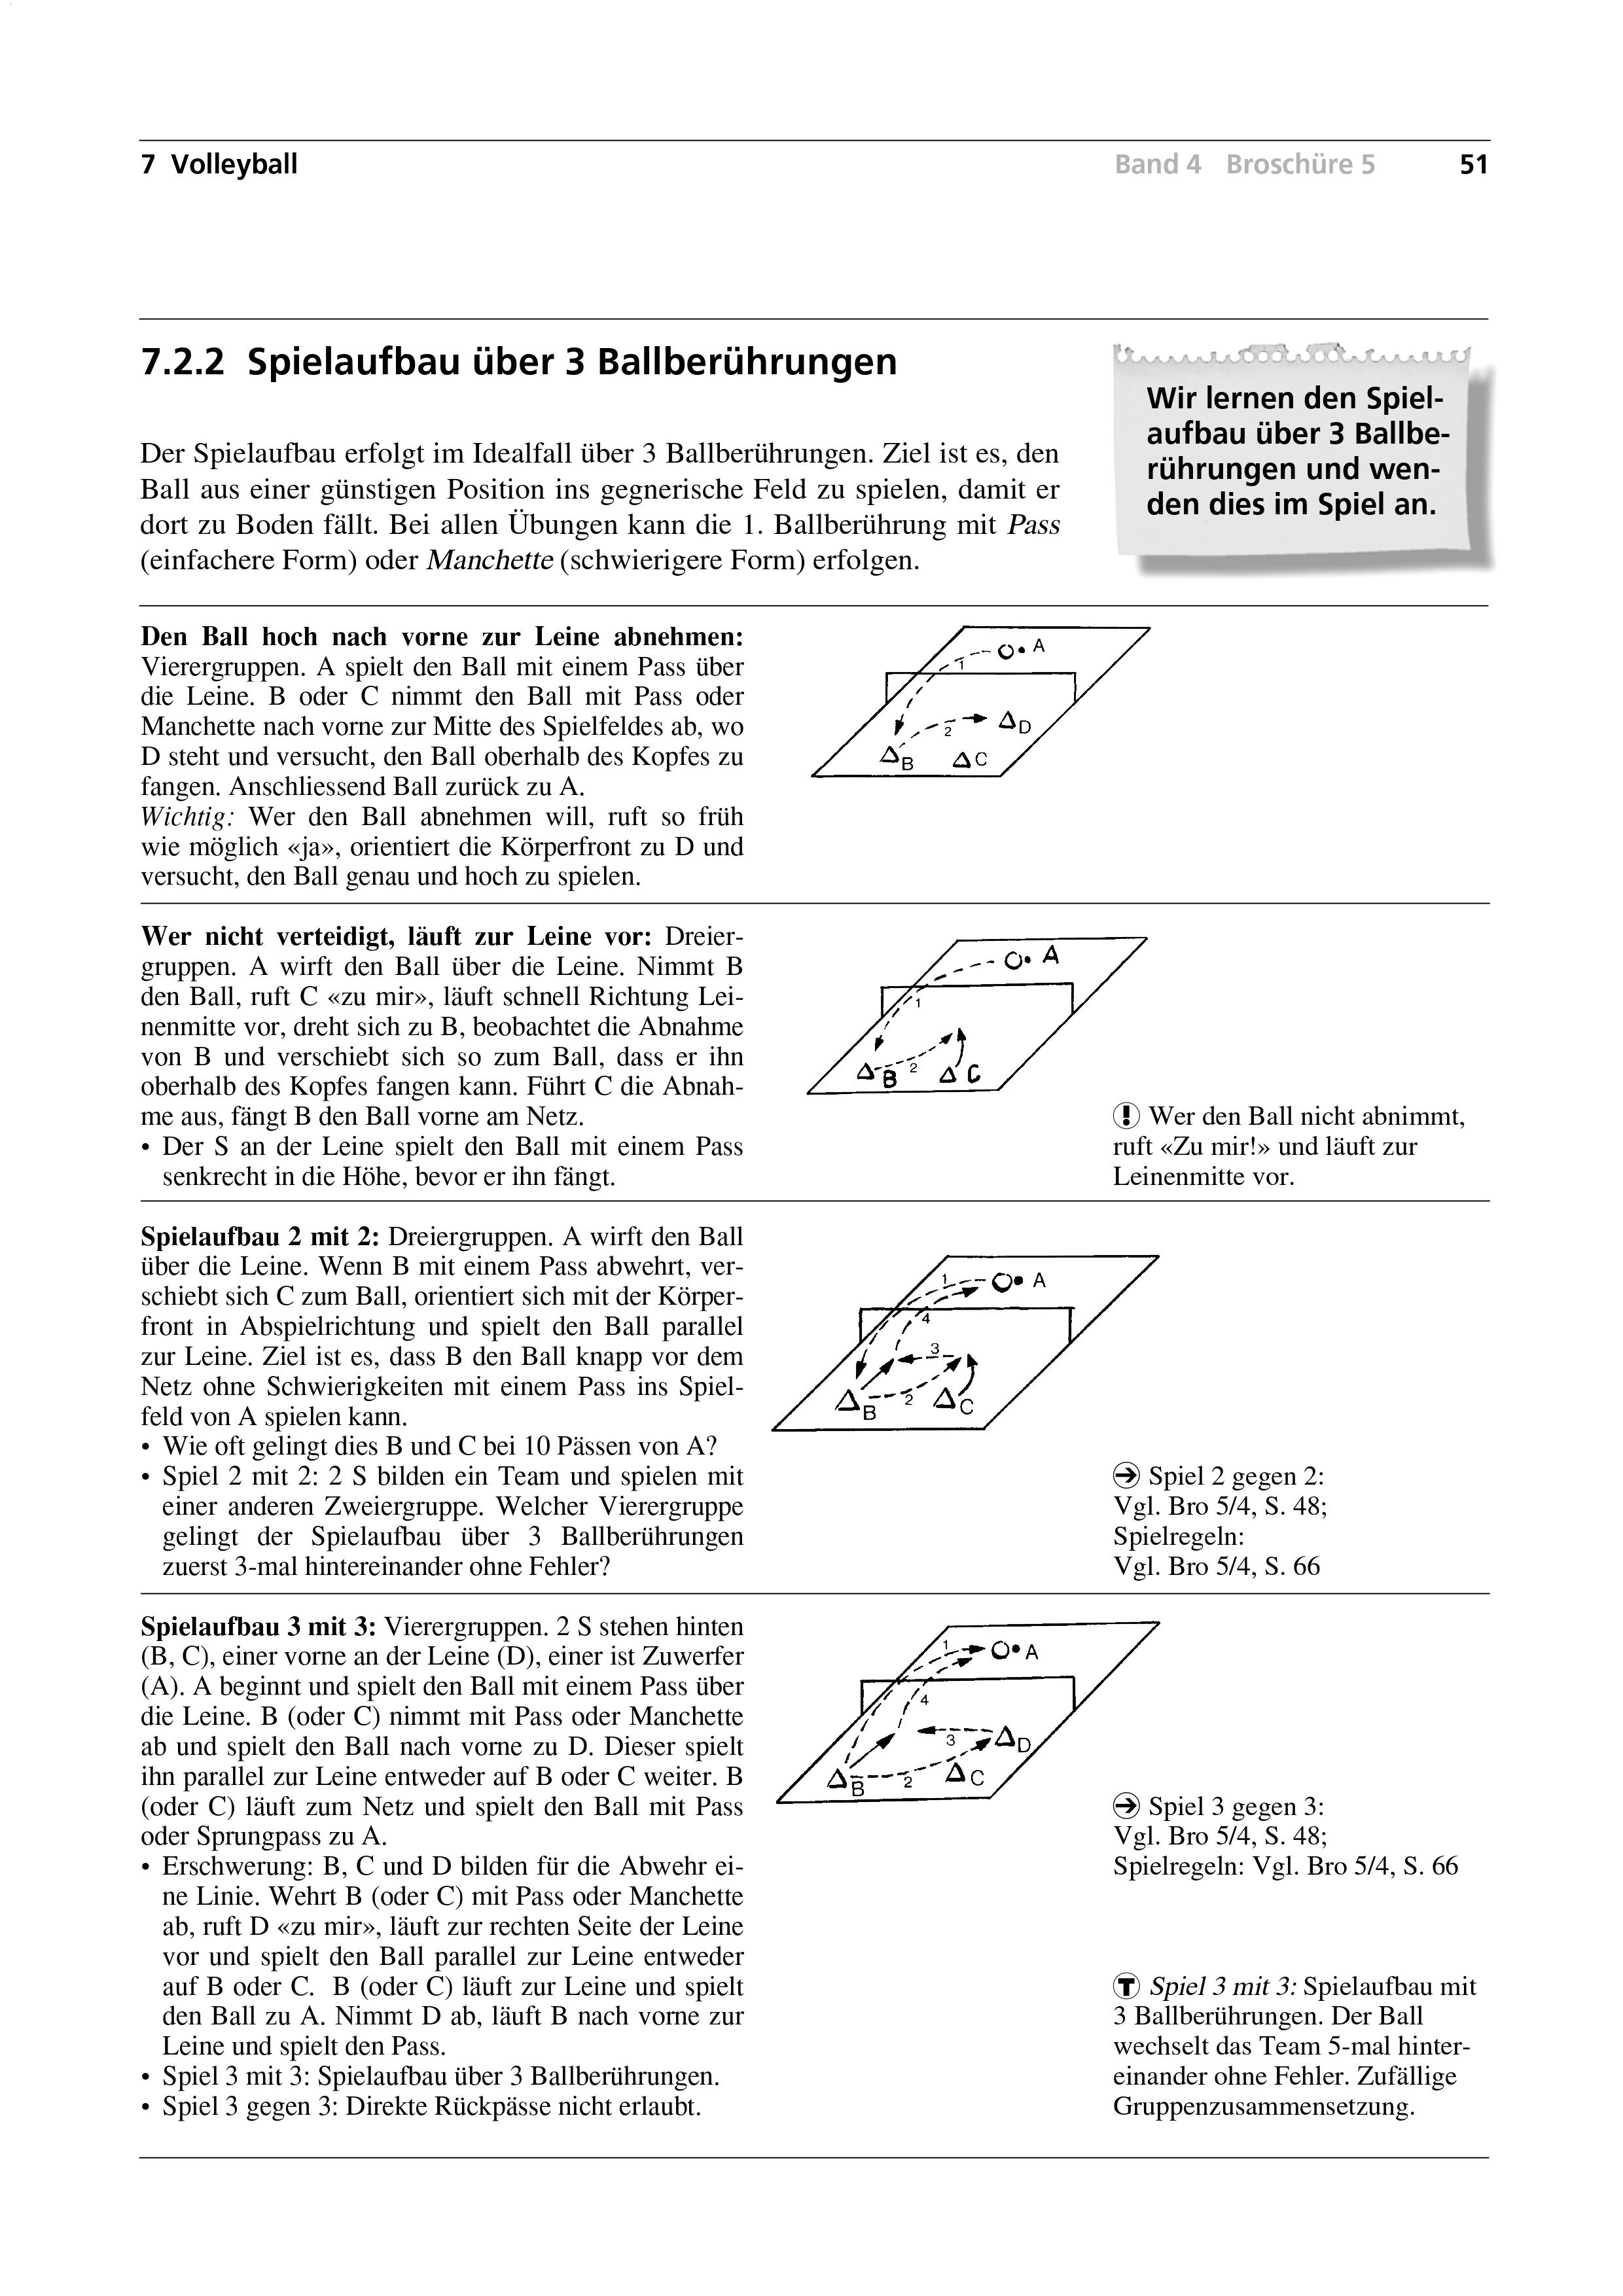 Preview image for LOM object Spielaufbau über 3 Ballberührungen